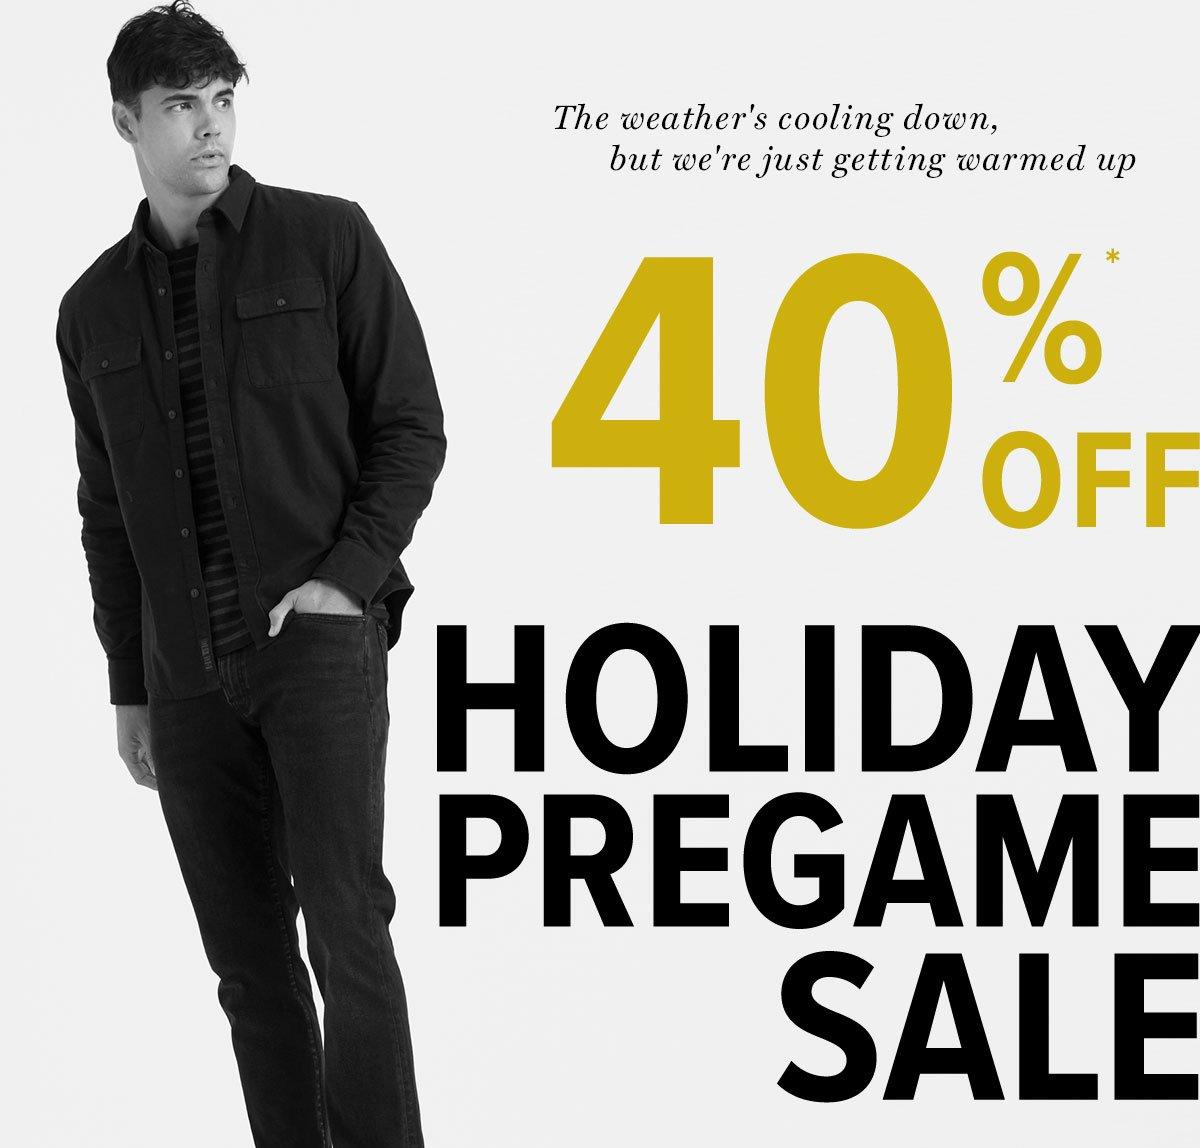 Shop Our Holiday Pregame Sale!*